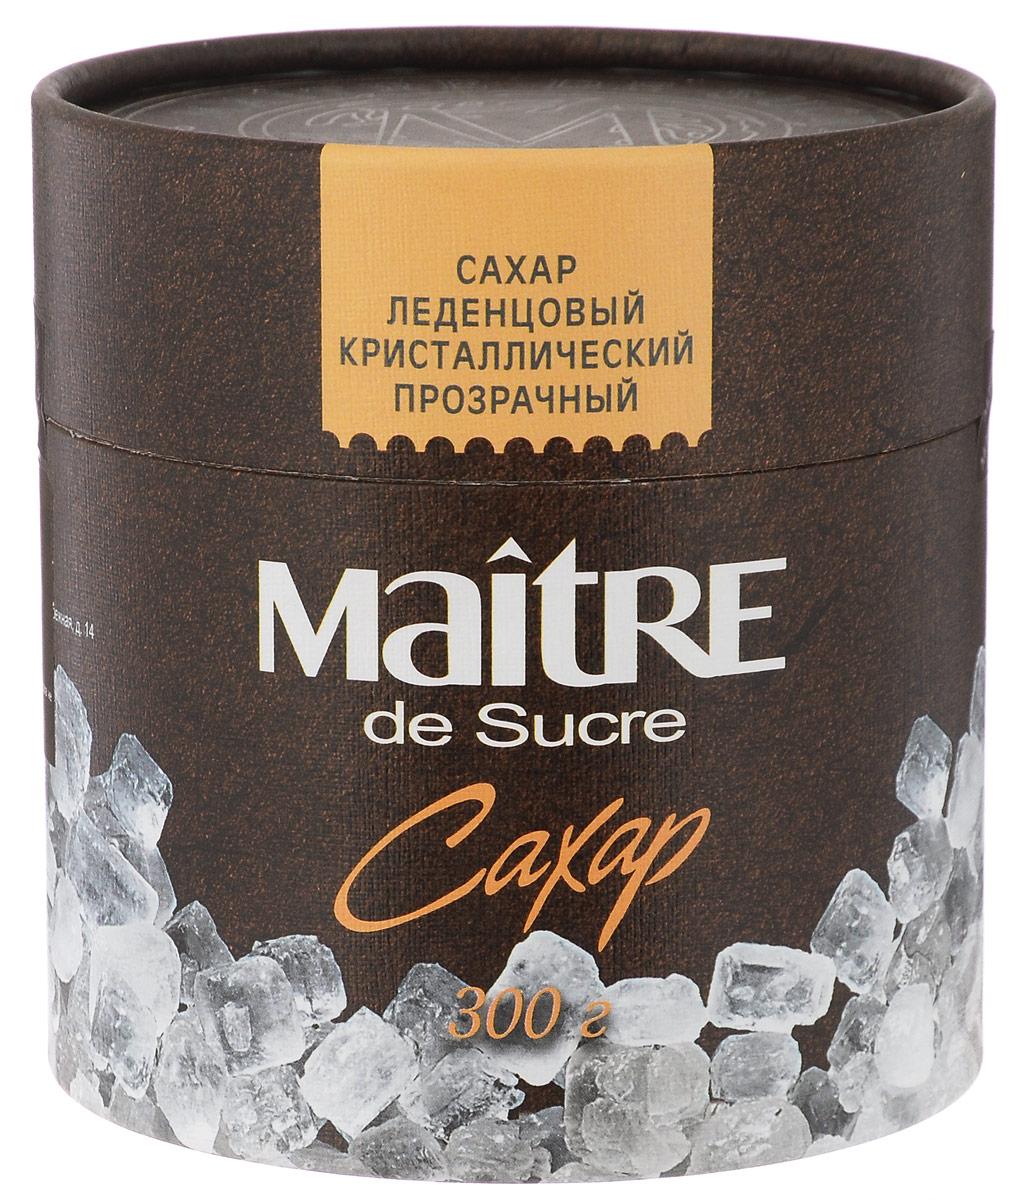 Maitre de Sucre сахар леденцовый прозрачный кристаллический, 300 г maitre сахар леденцовый кристаллический прозрачный 800 г